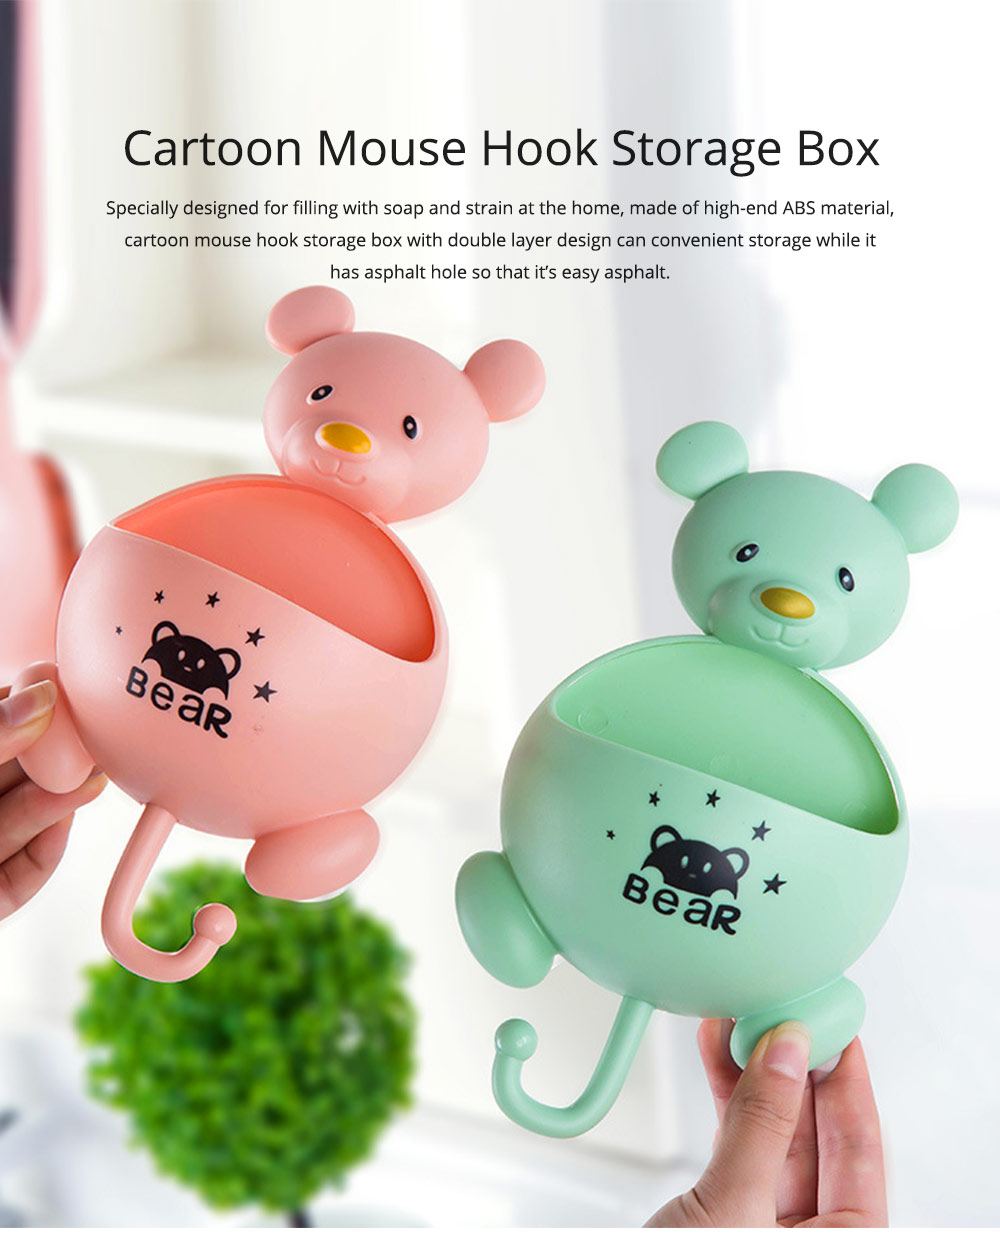 Wall Mounted Creative Bathroom Soap Box, Multifunctional Cartoon Mouse Hook Storage Box with Magic Sucker 0